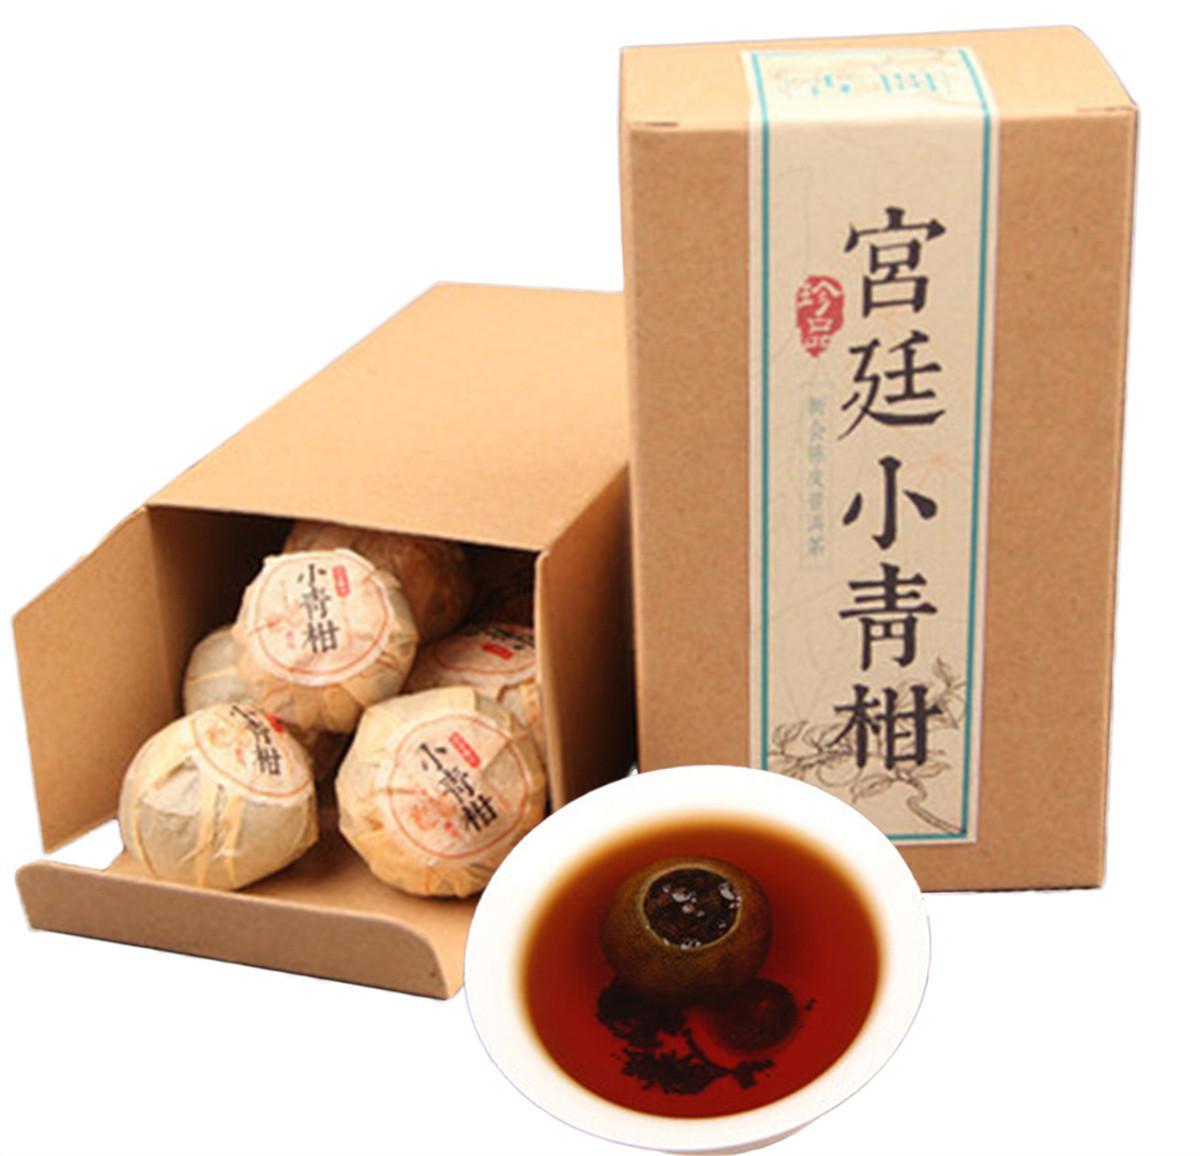 Yunnan Puerh Tee Xinhui Citrus Puer kleine grüne Zitrus gekocht pu er Schwarzer Tee Boxed 100g Chinesische Puer Grüne Lebensmittel Reife Puerh